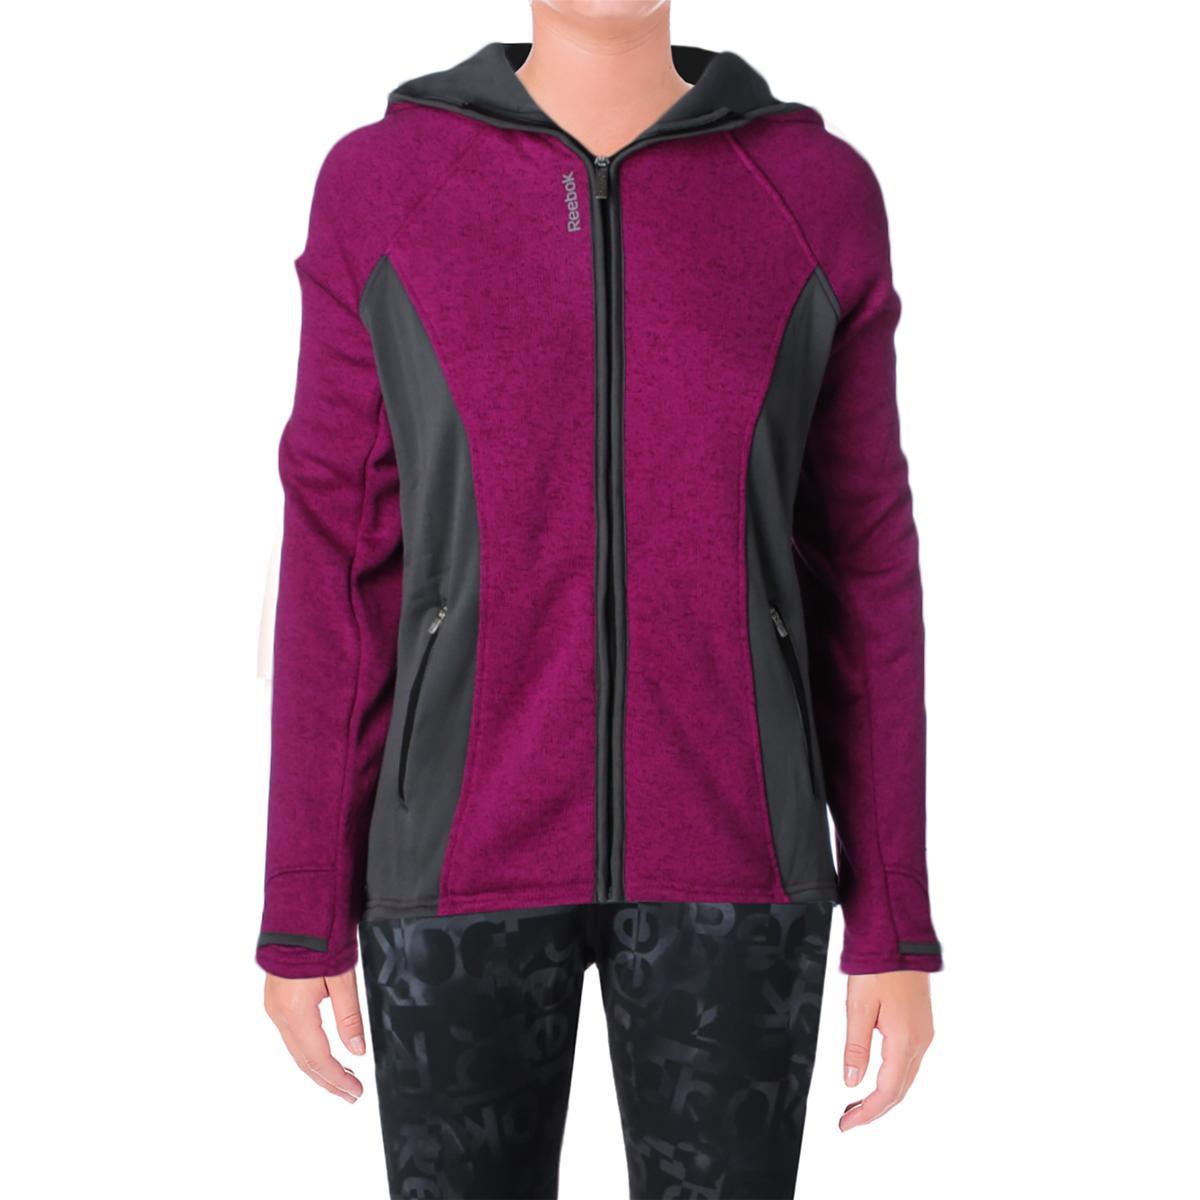 1440d1459ab reebok jacket cheap   OFF41% The Largest Catalog Discounts